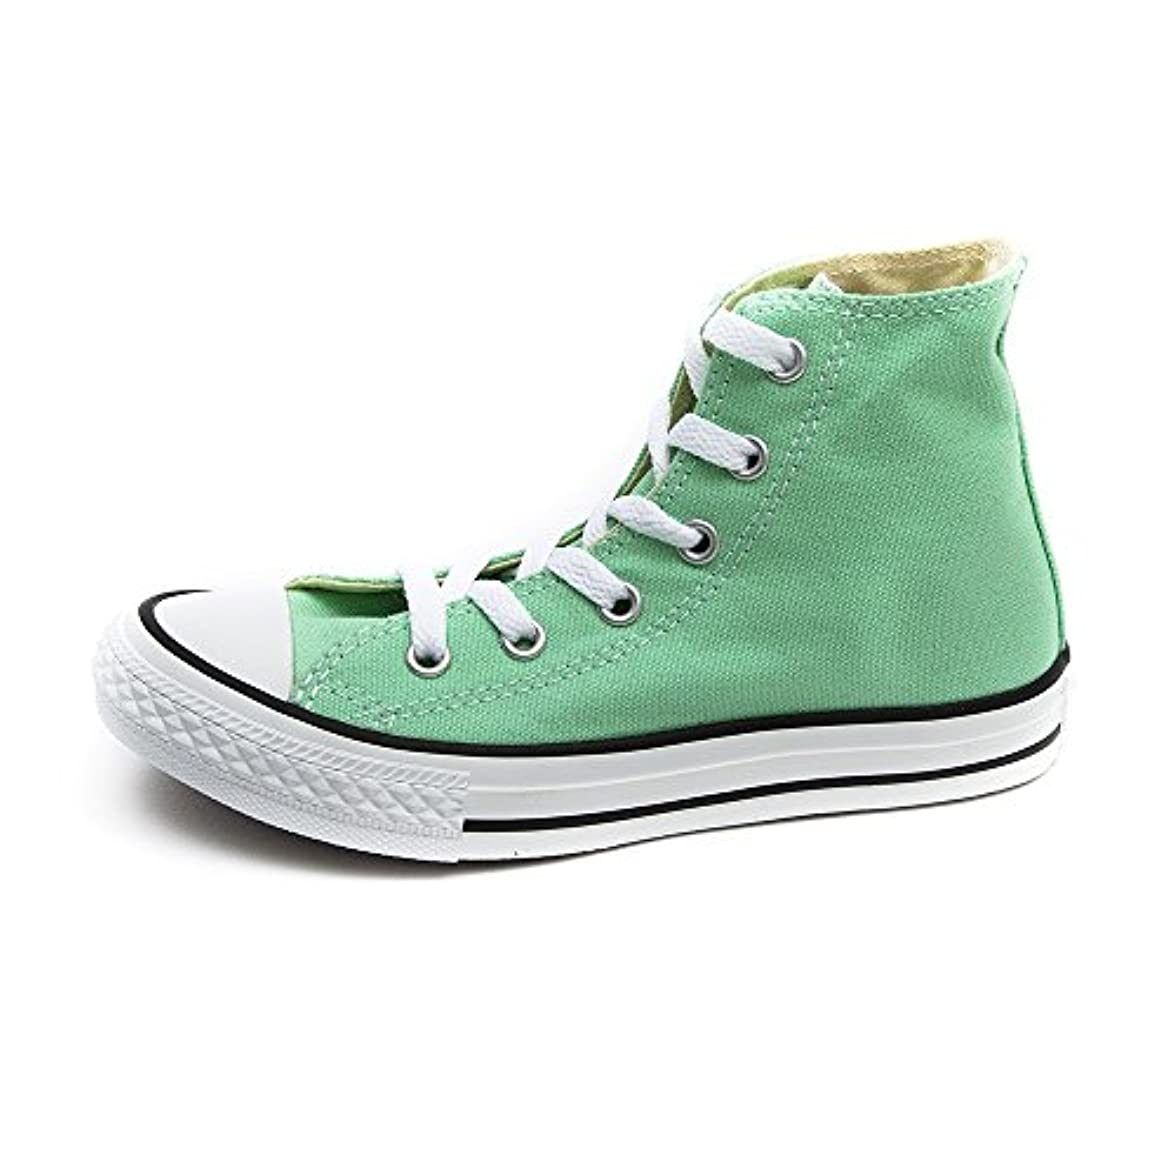 Converse Sneaker All Star Hi Canvas Verde Menta Eu 29